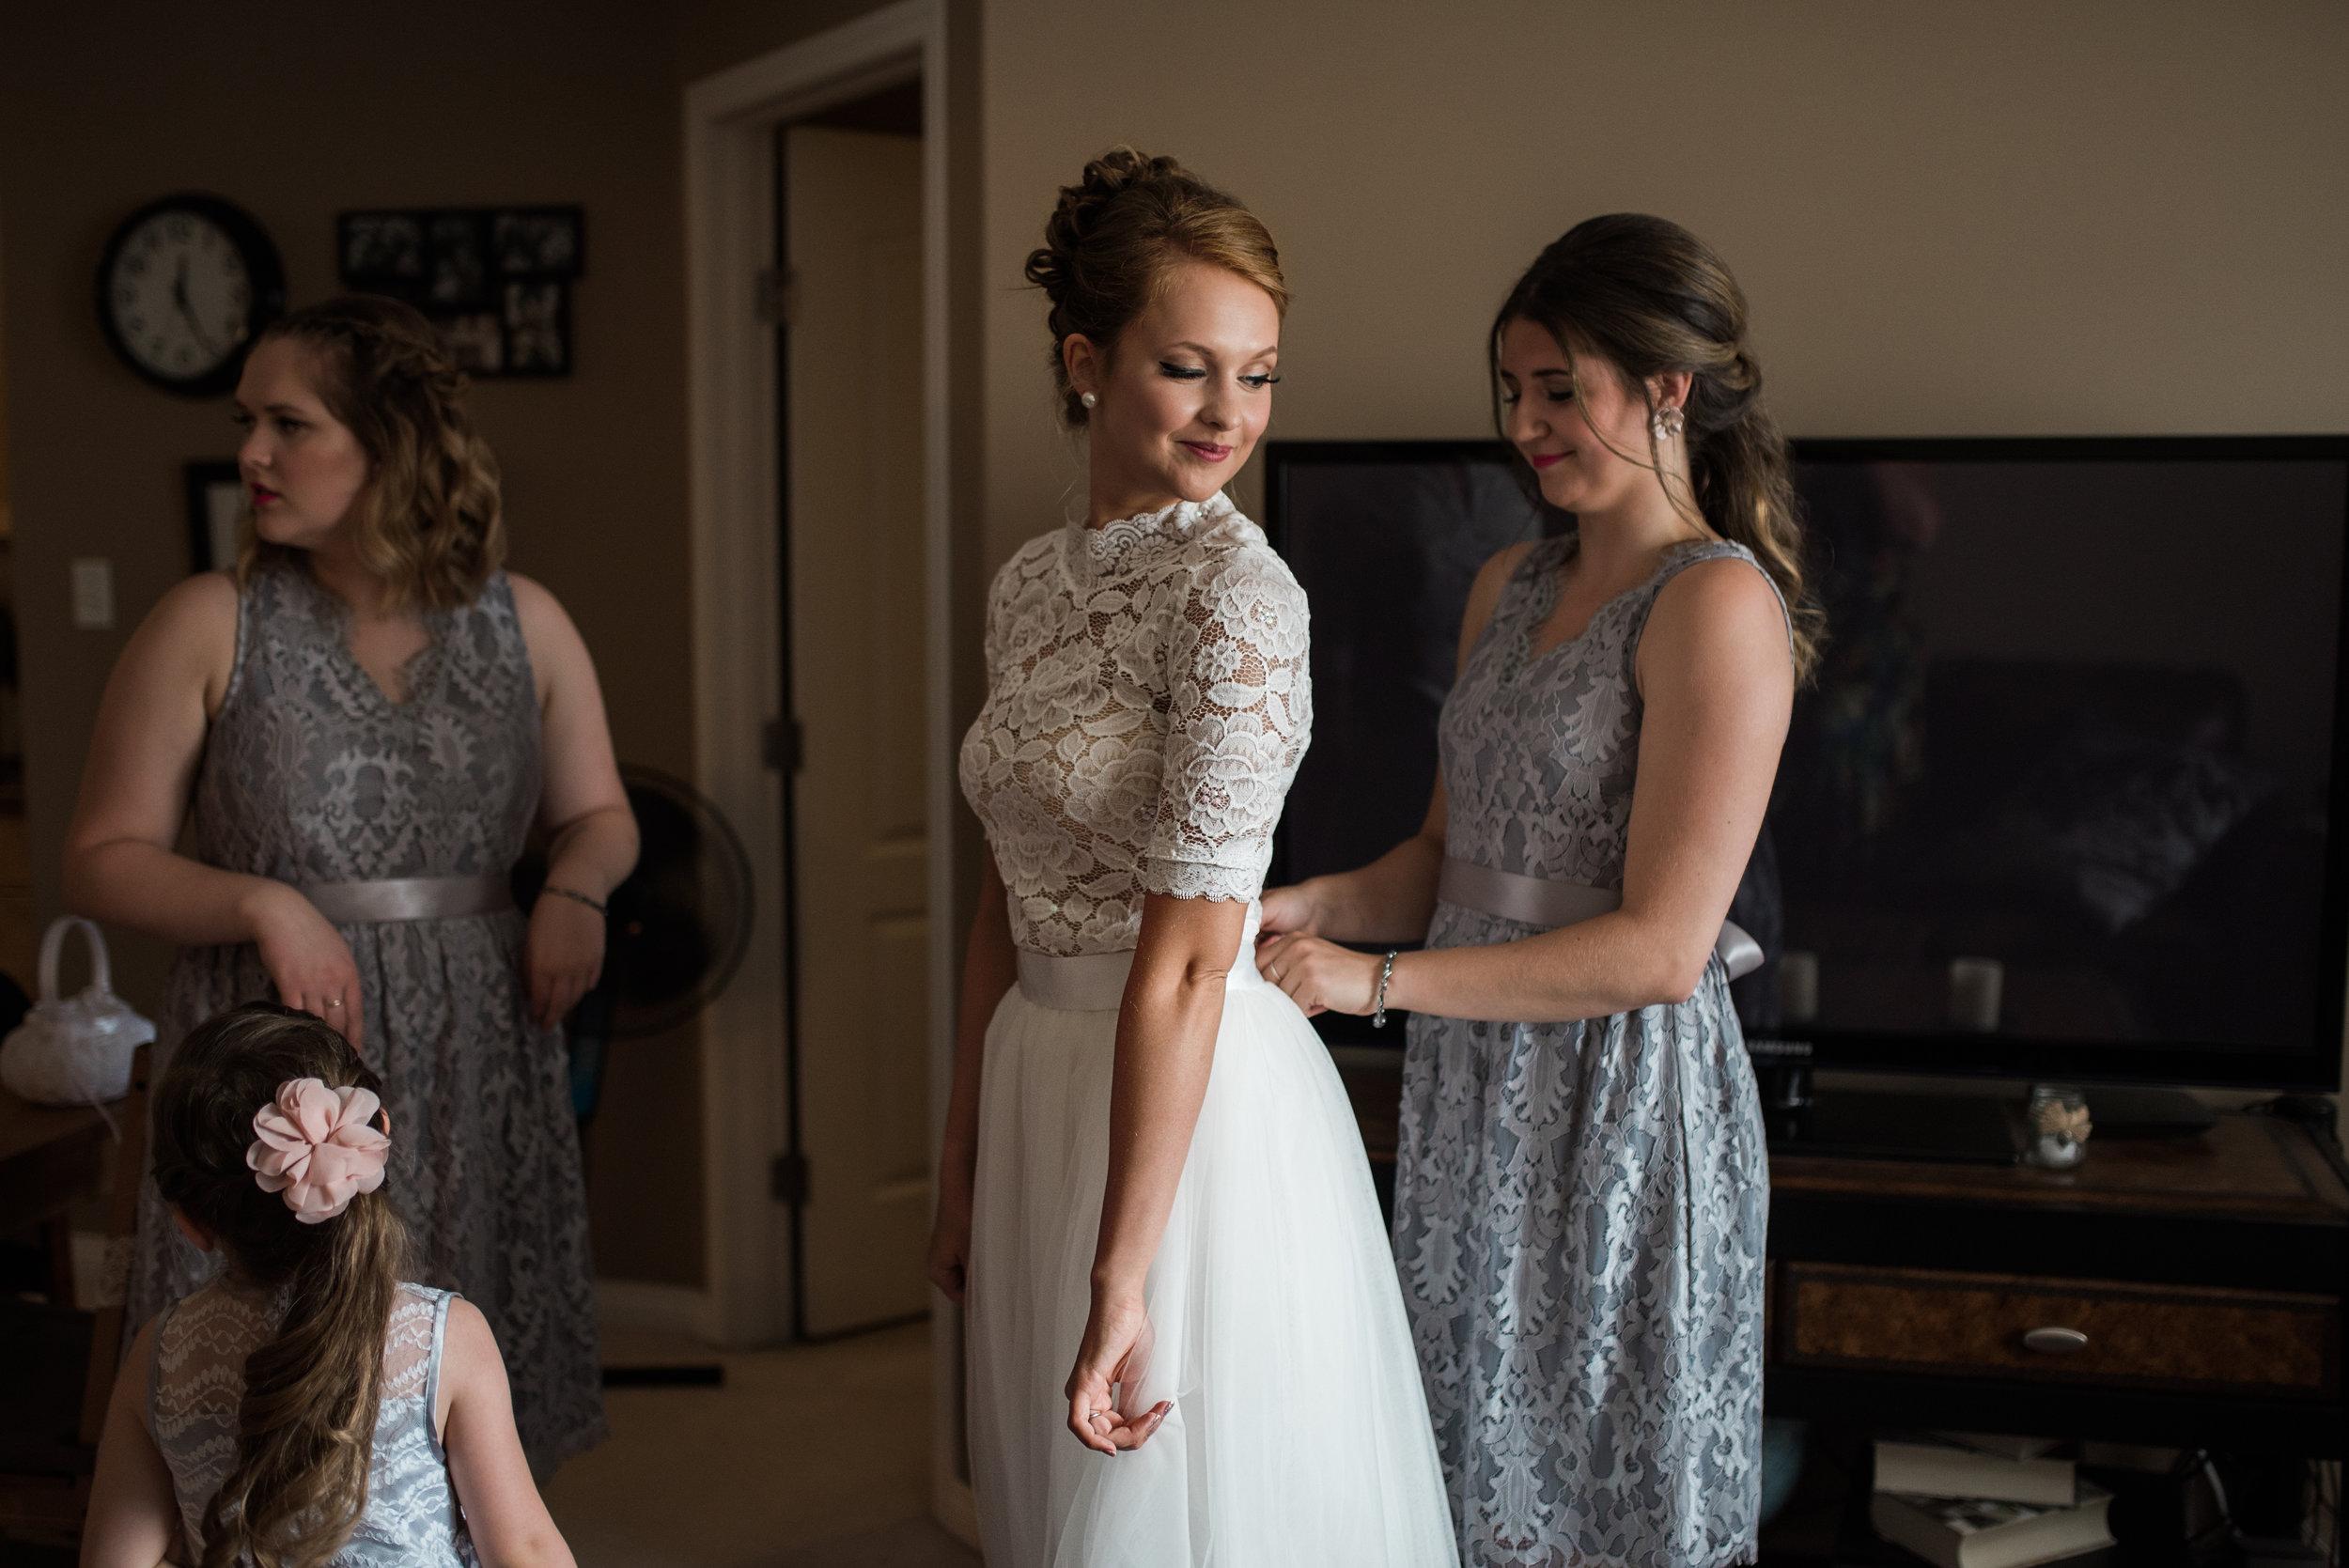 Elgert Wedding 256-Edit.jpg